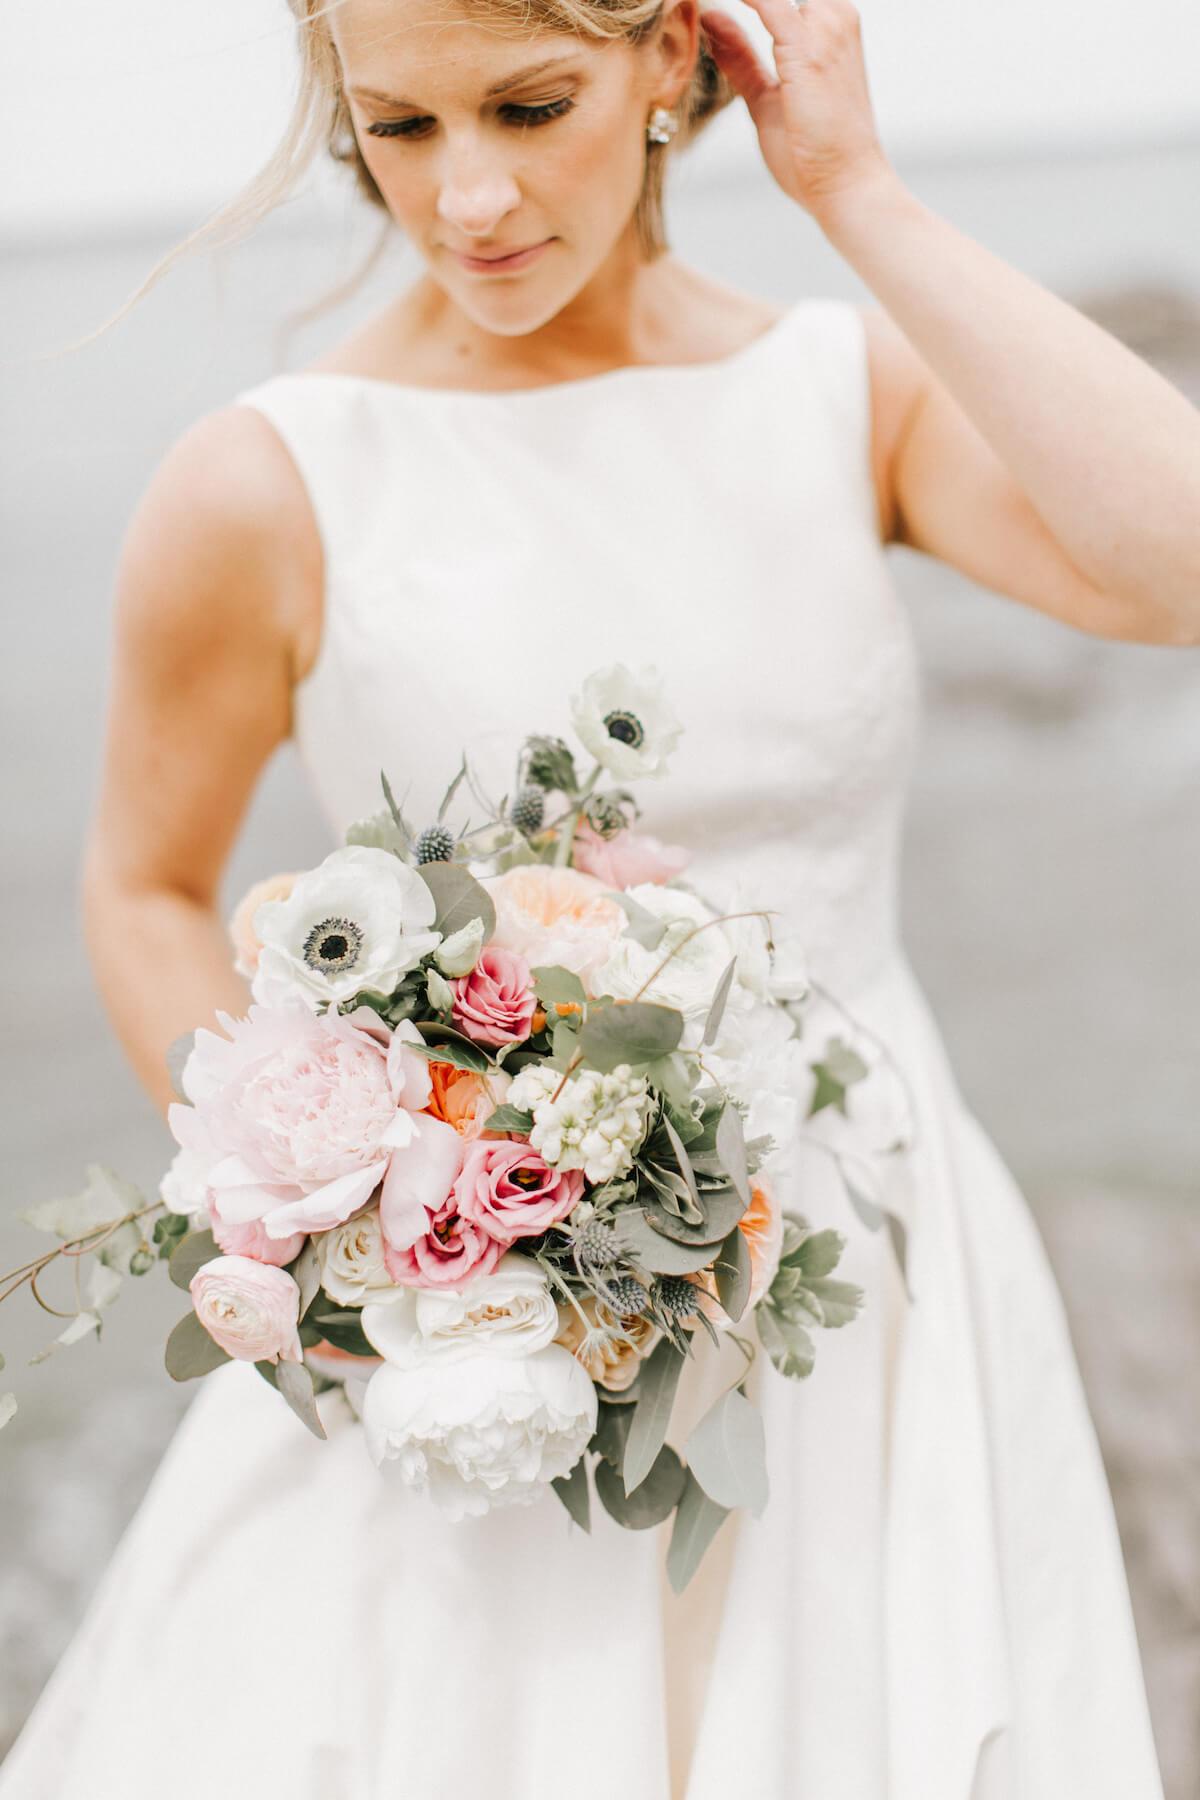 classic-bridal-bouquet-pastel-pink-roses.jpg